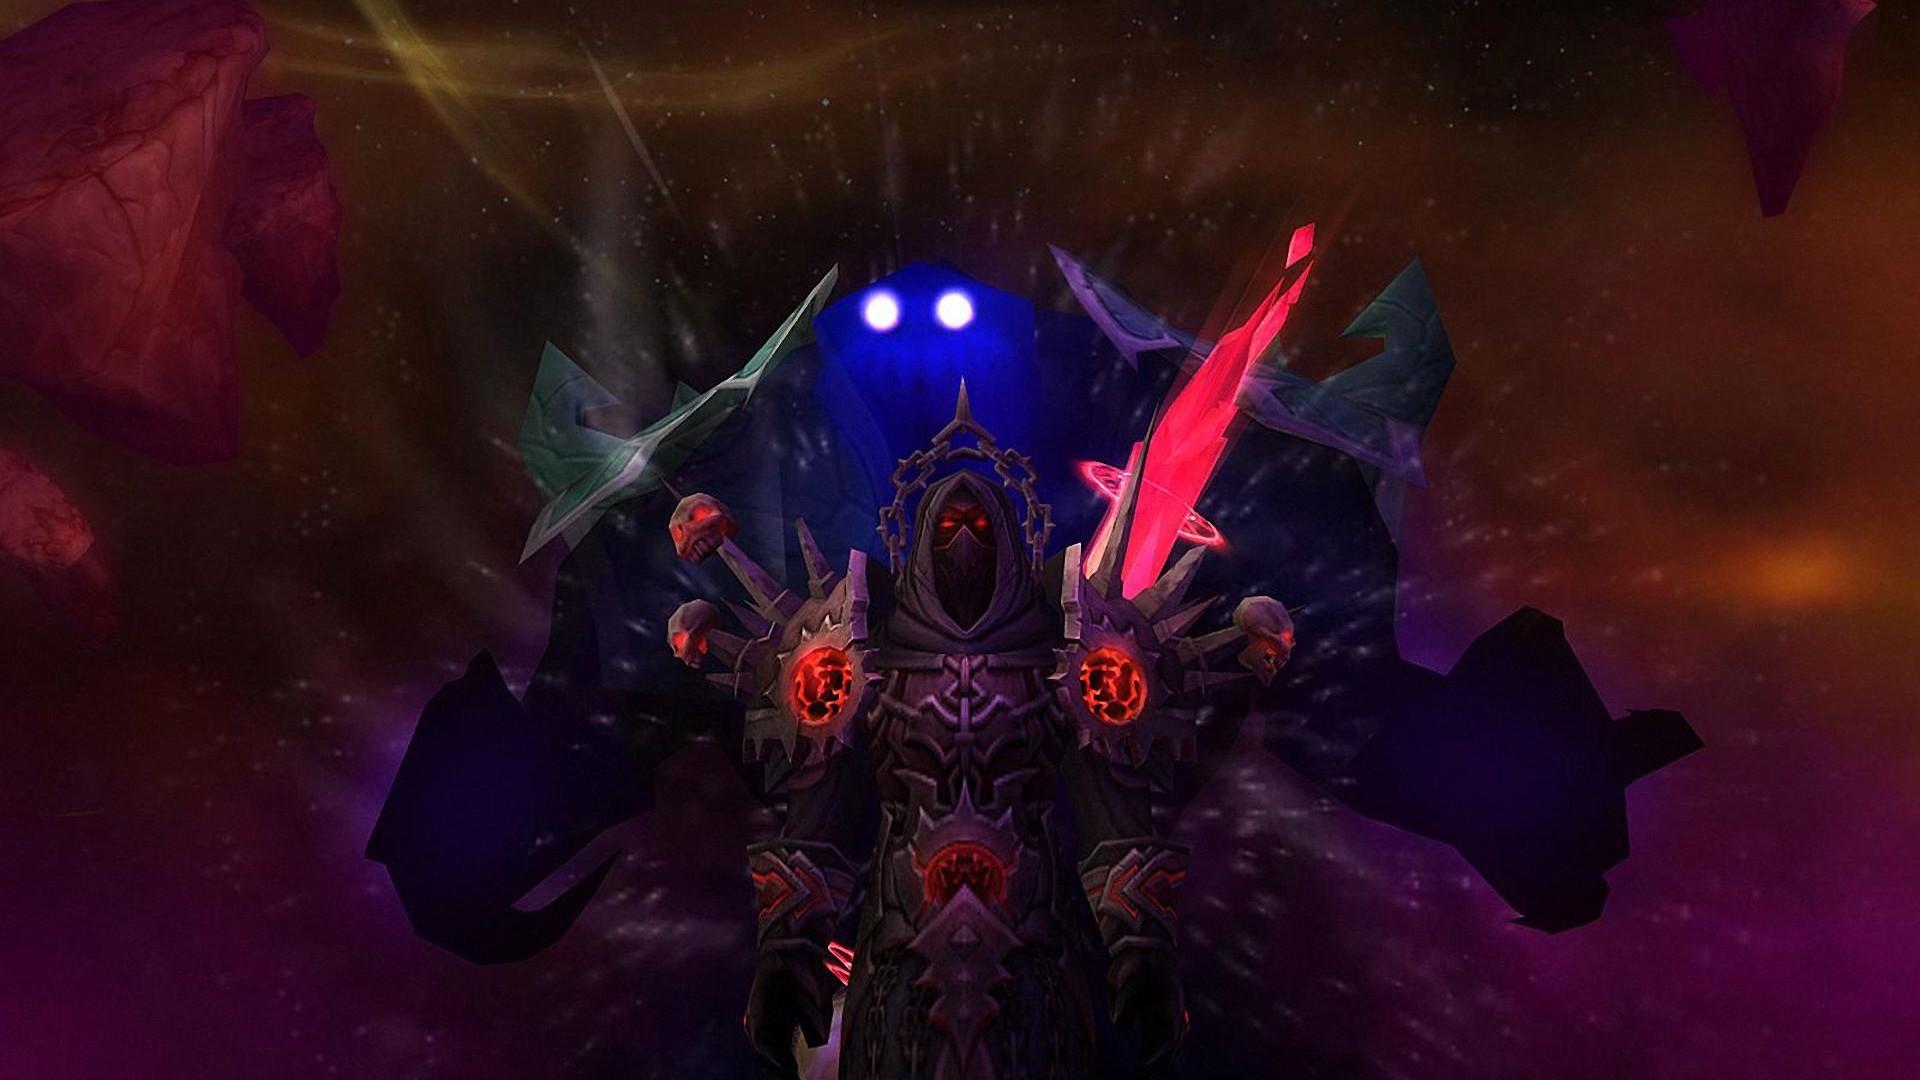 world of warcraft: the burning crusade - warlock hd wallpaper